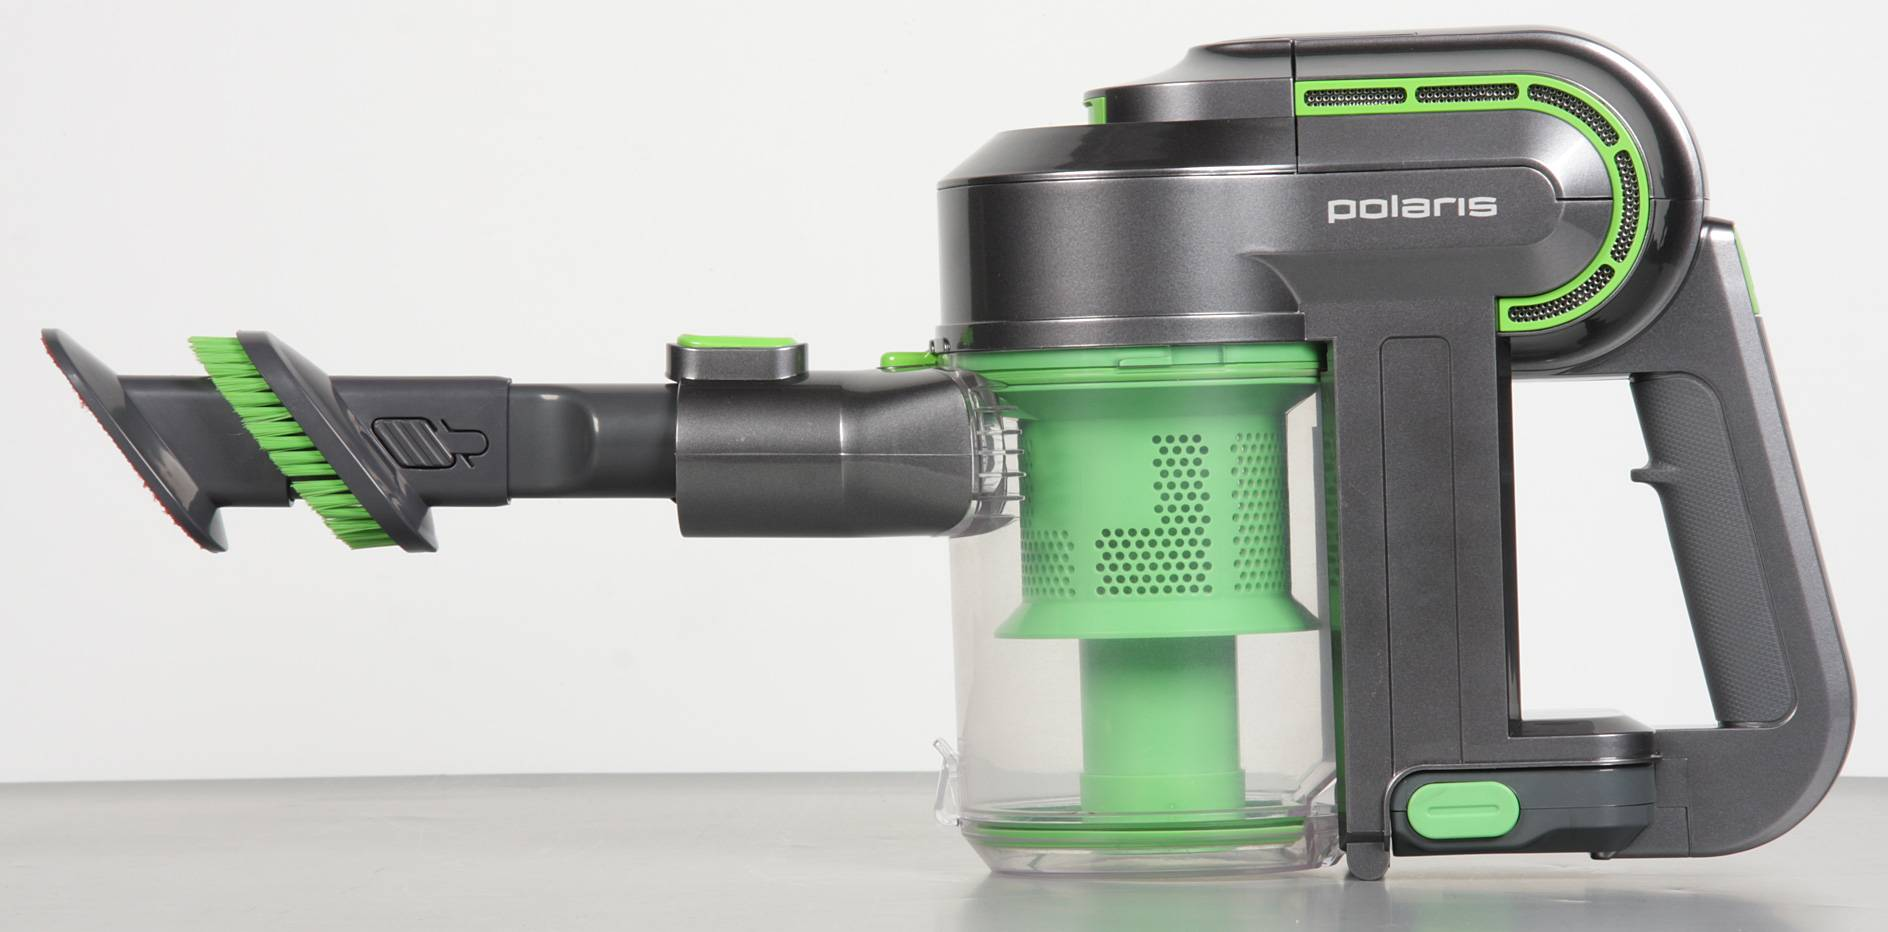 Polaris pvcr 0410d